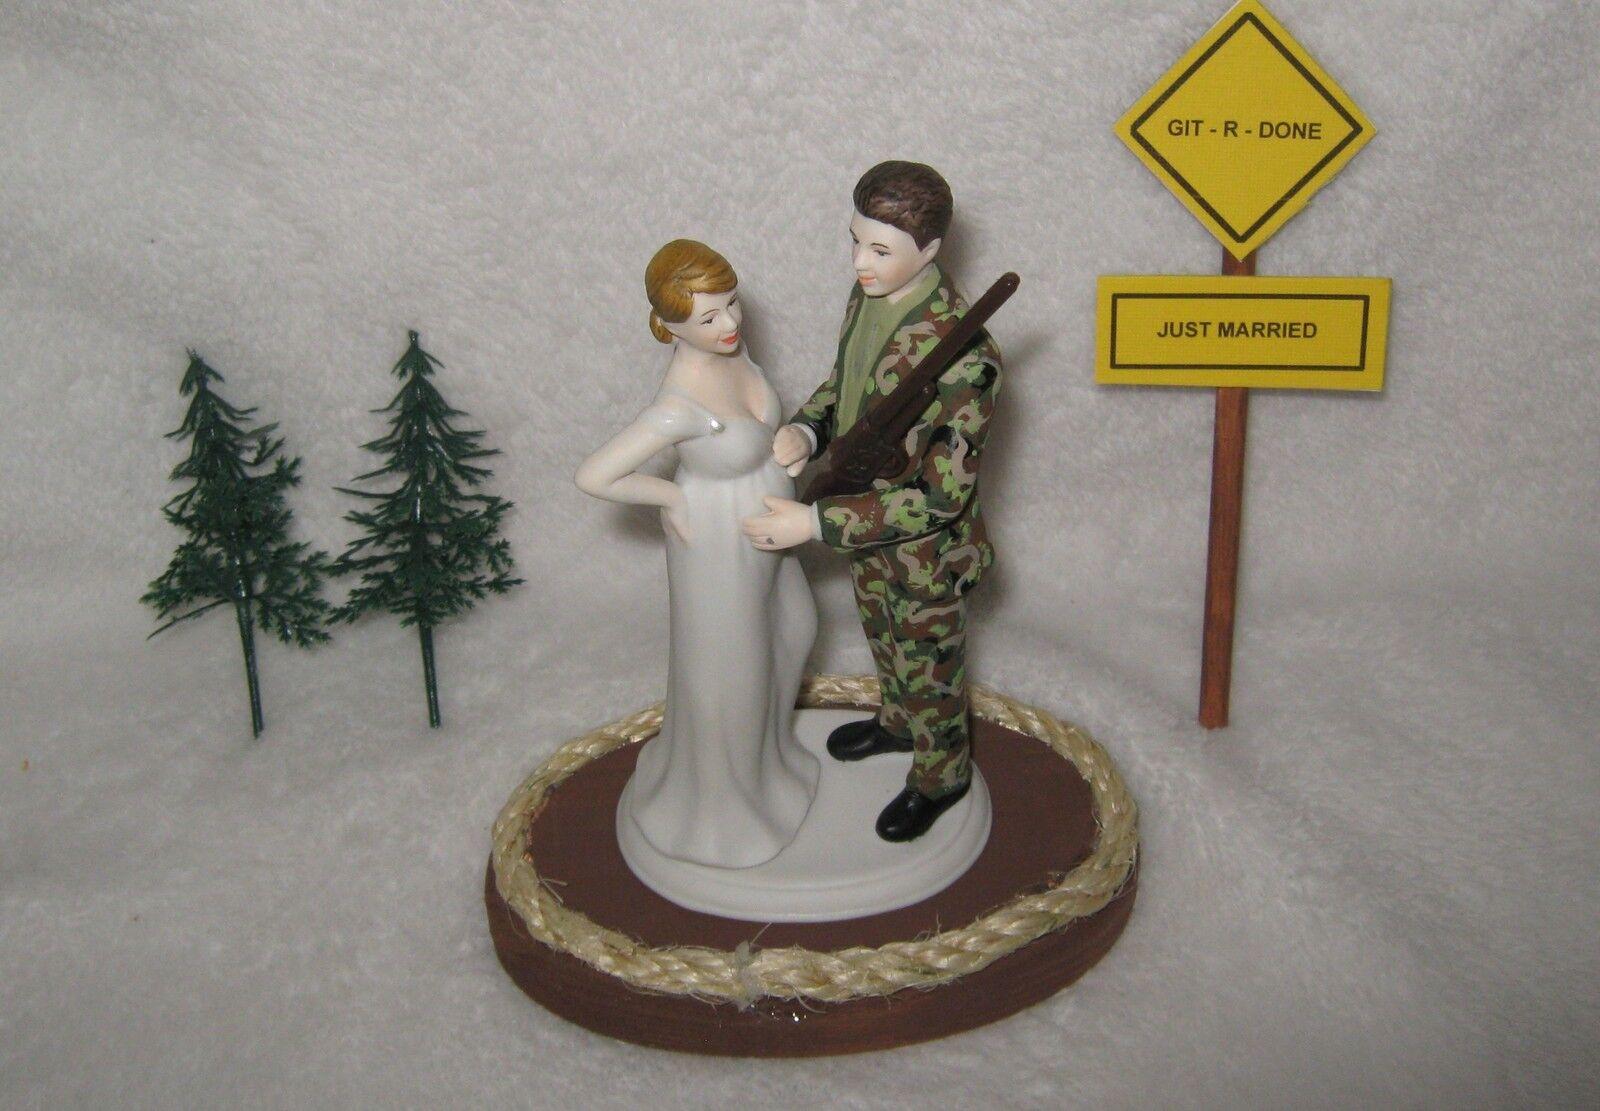 Shotgun wedding Camo Groom  enceinte Mariée  baby cake topper Git R fait signe